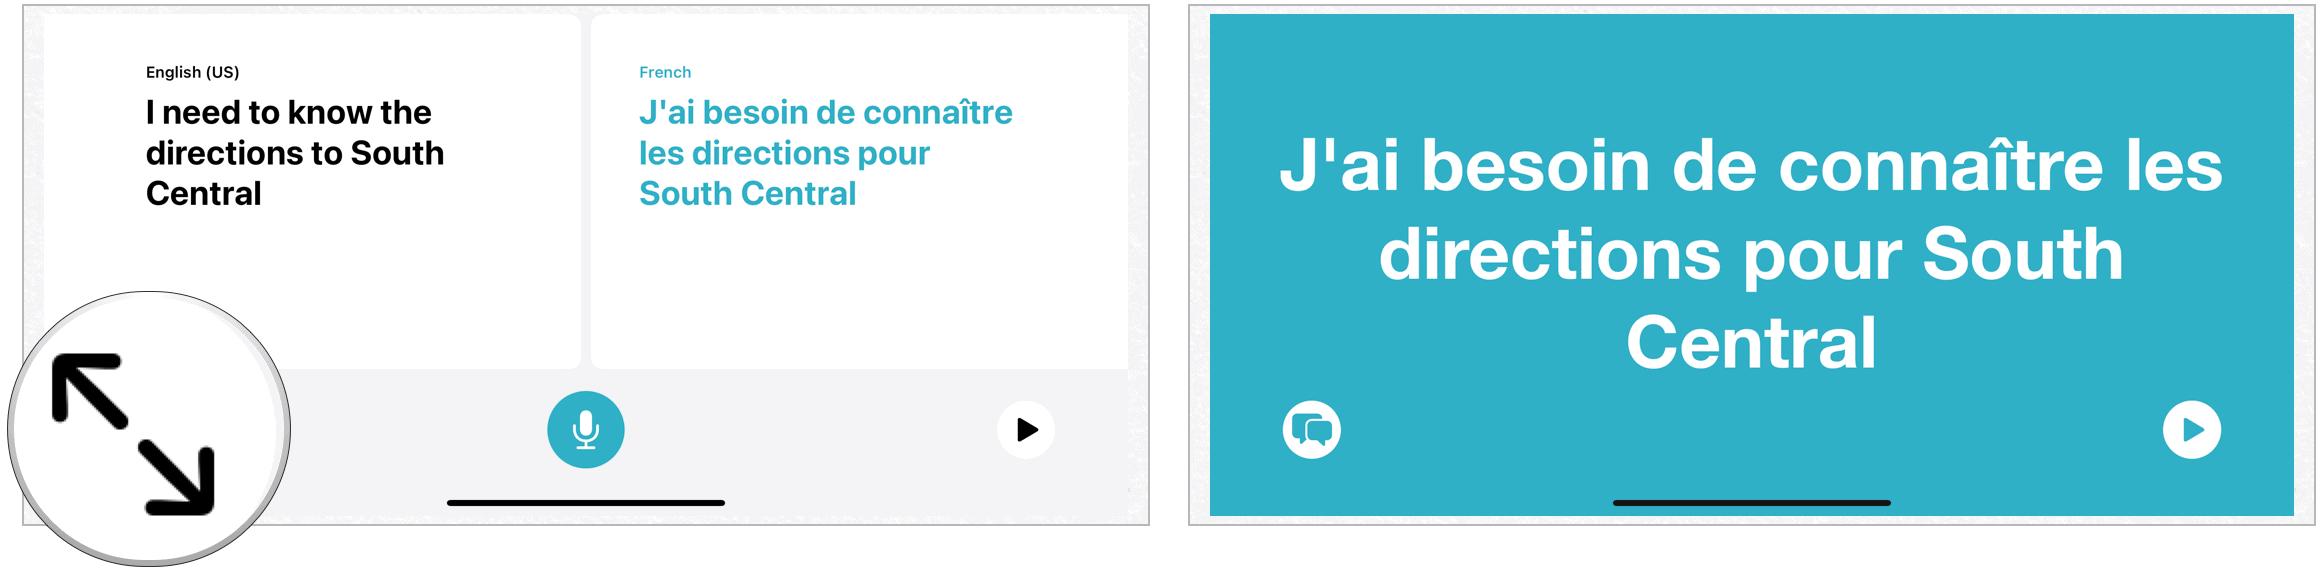 Translation expand mode